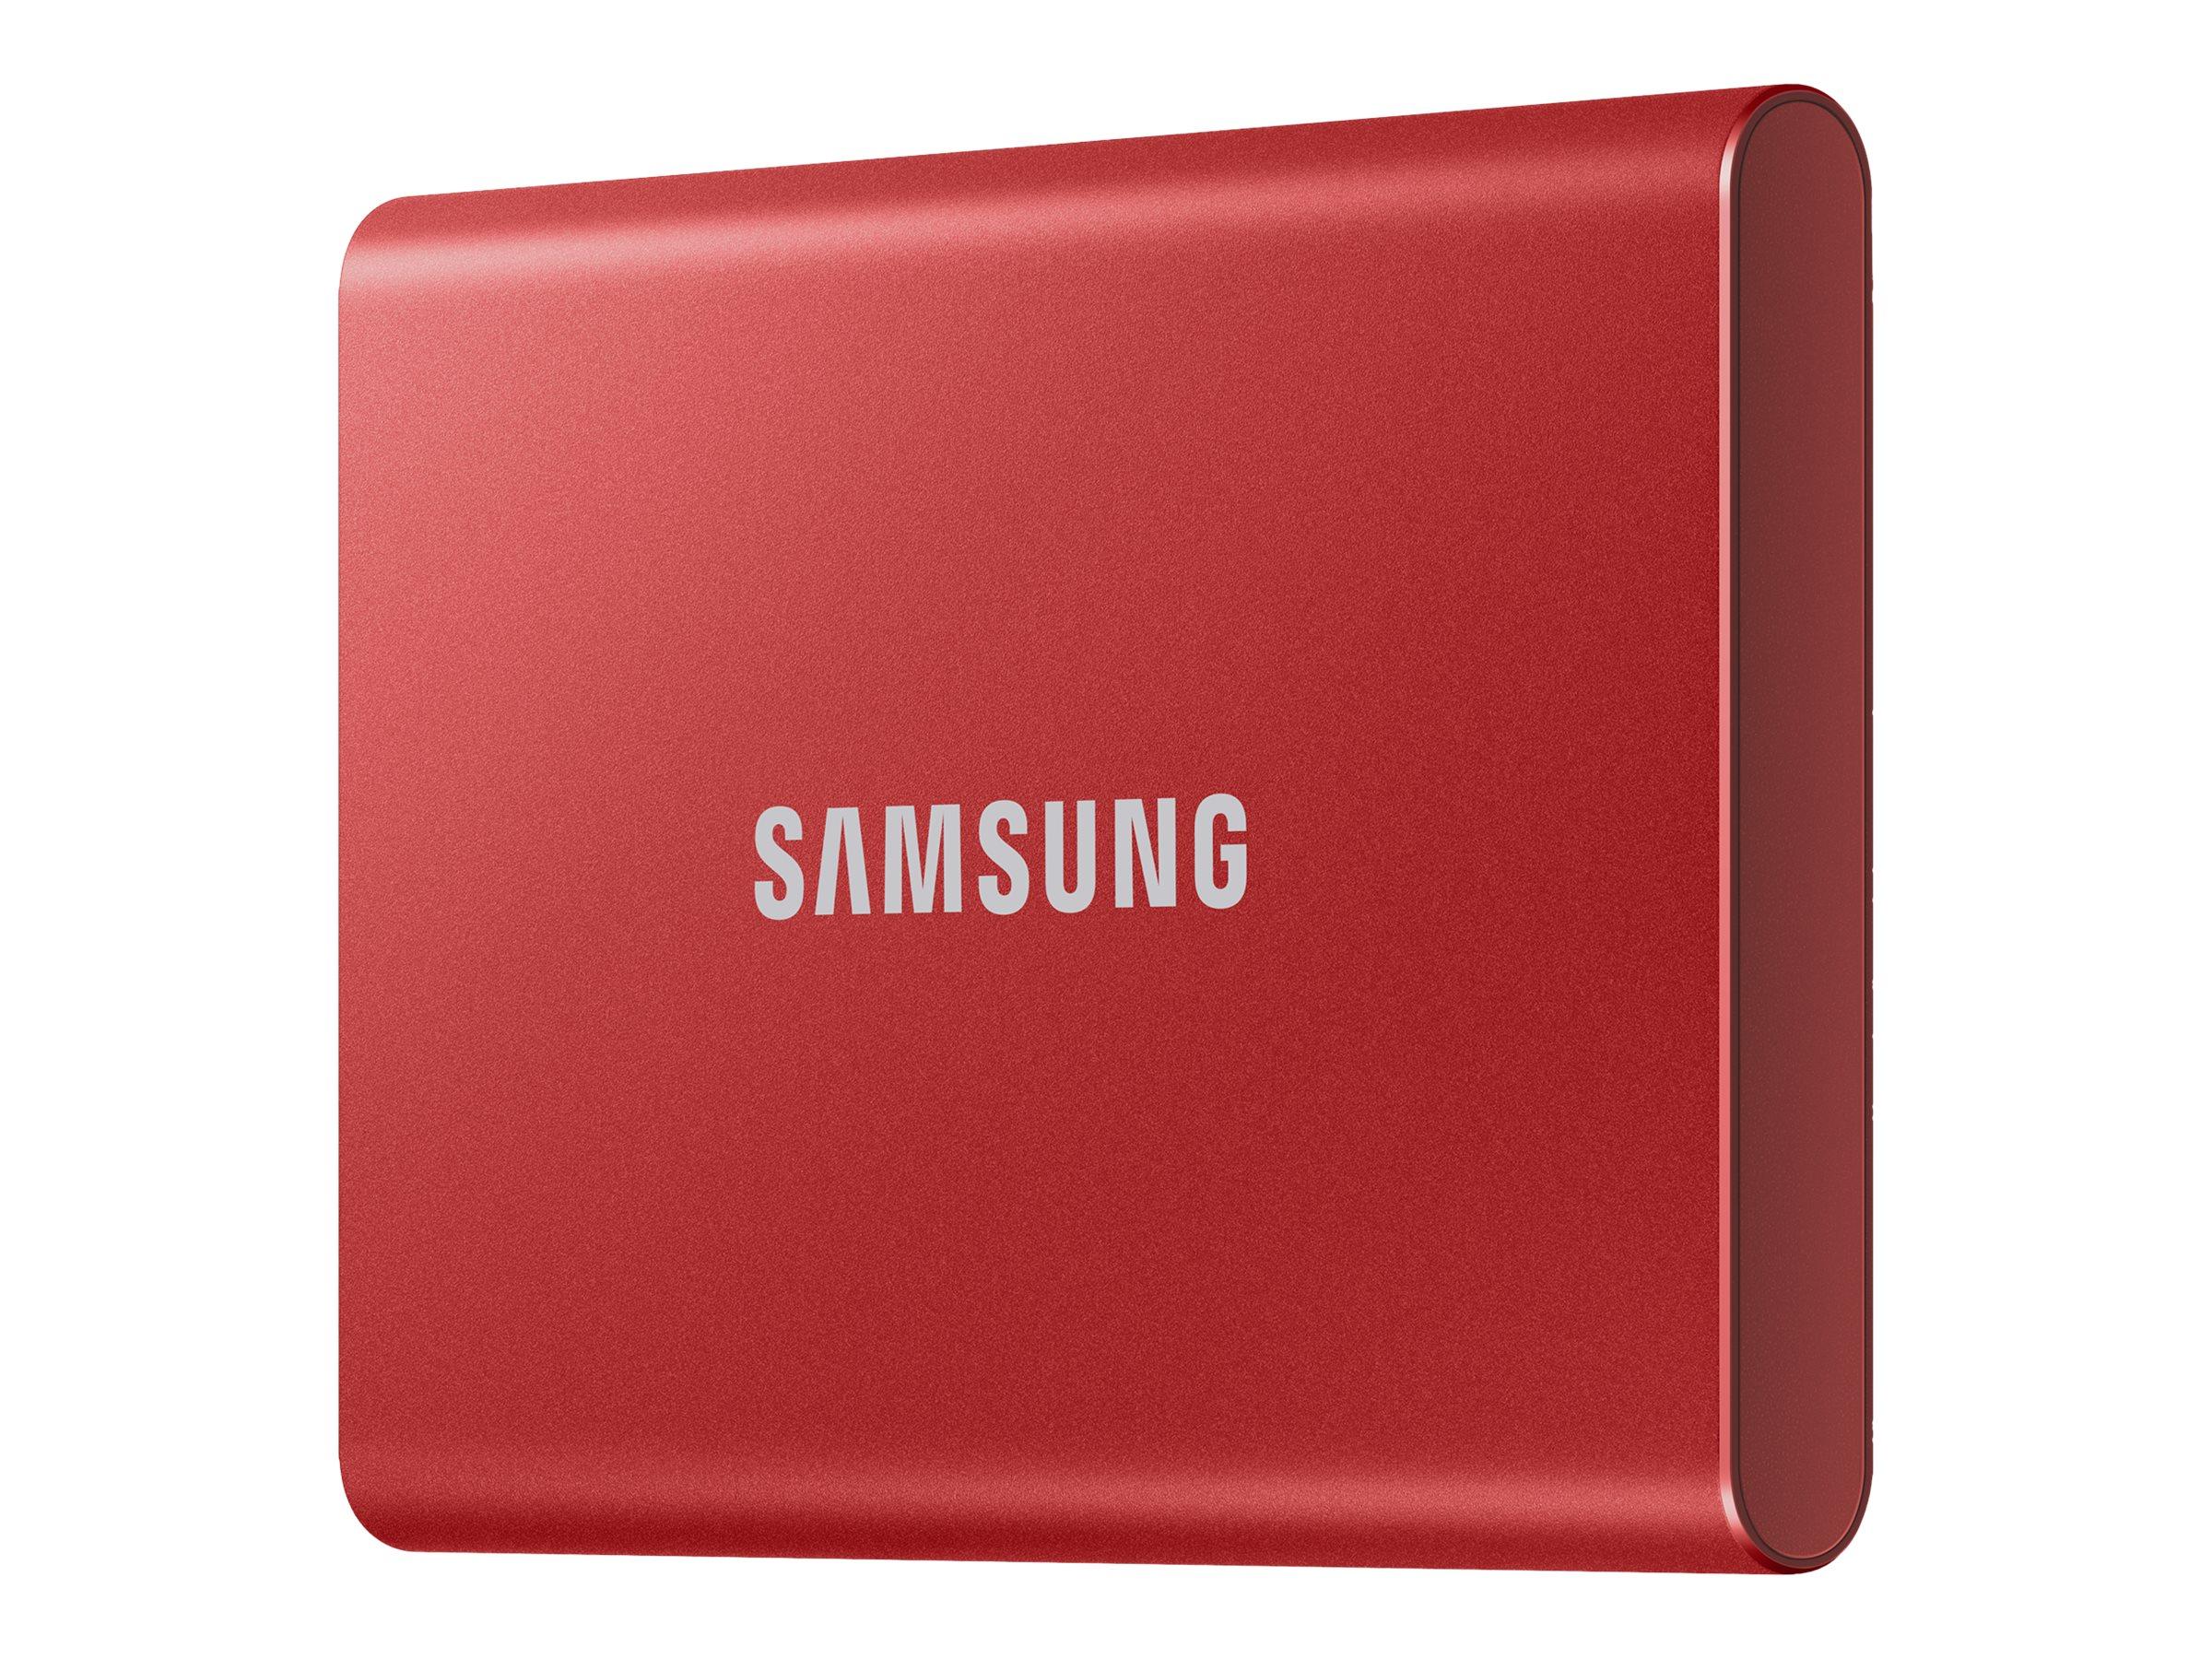 Vorschau: Samsung Portable SSD T7 MU-PC2T0R - 2 TB SSD - extern (tragbar)